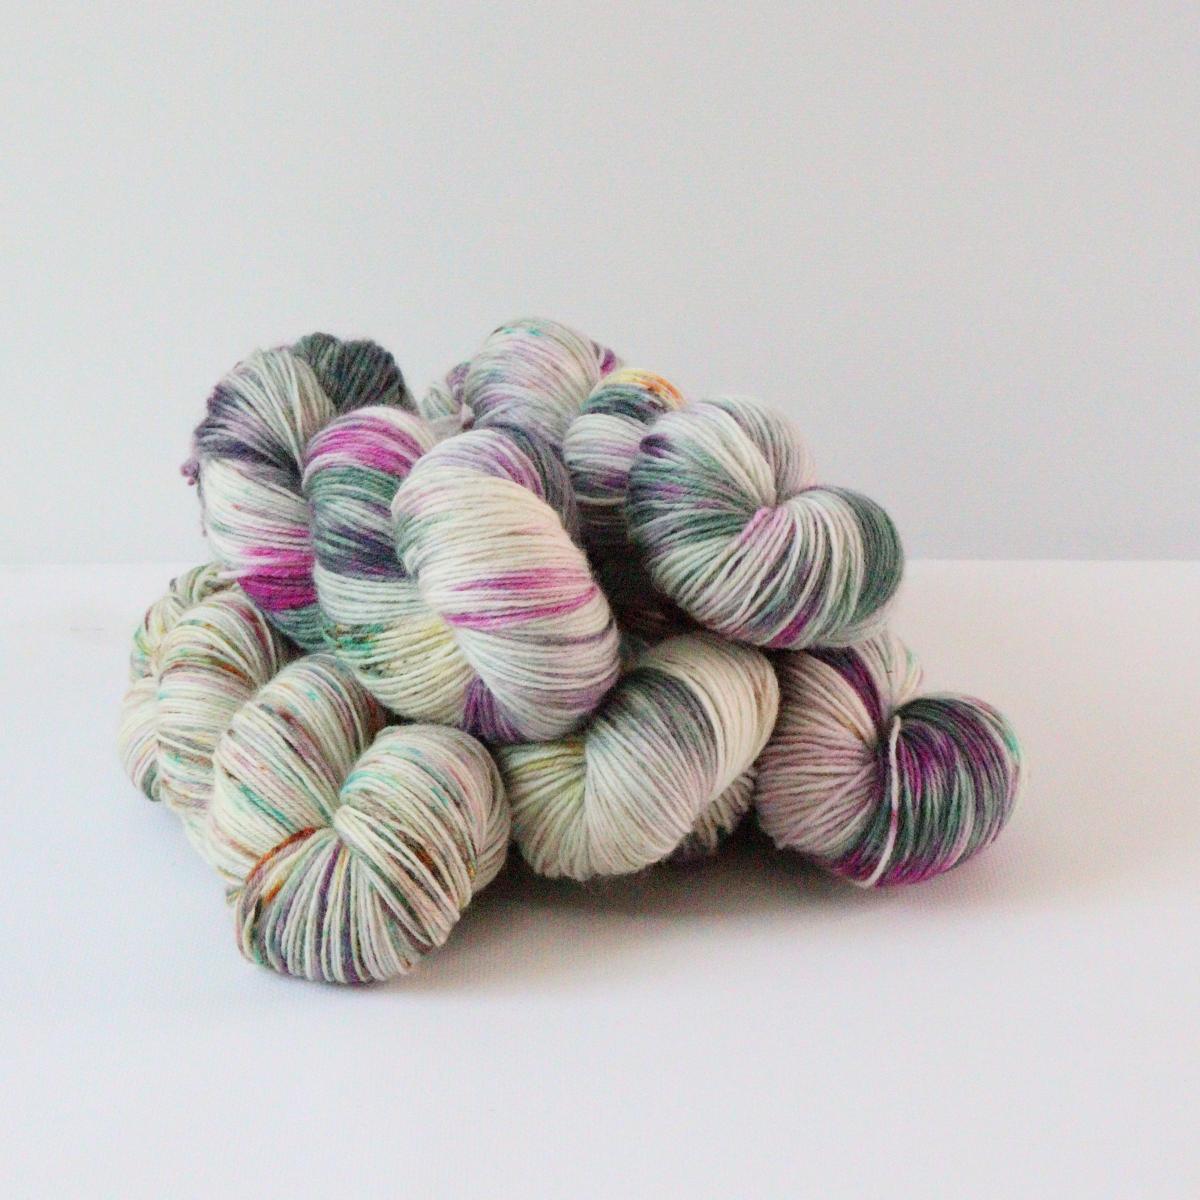 woodico.pro hand dyed yarn 079 1200x1200 - Hand dyed yarn / 079